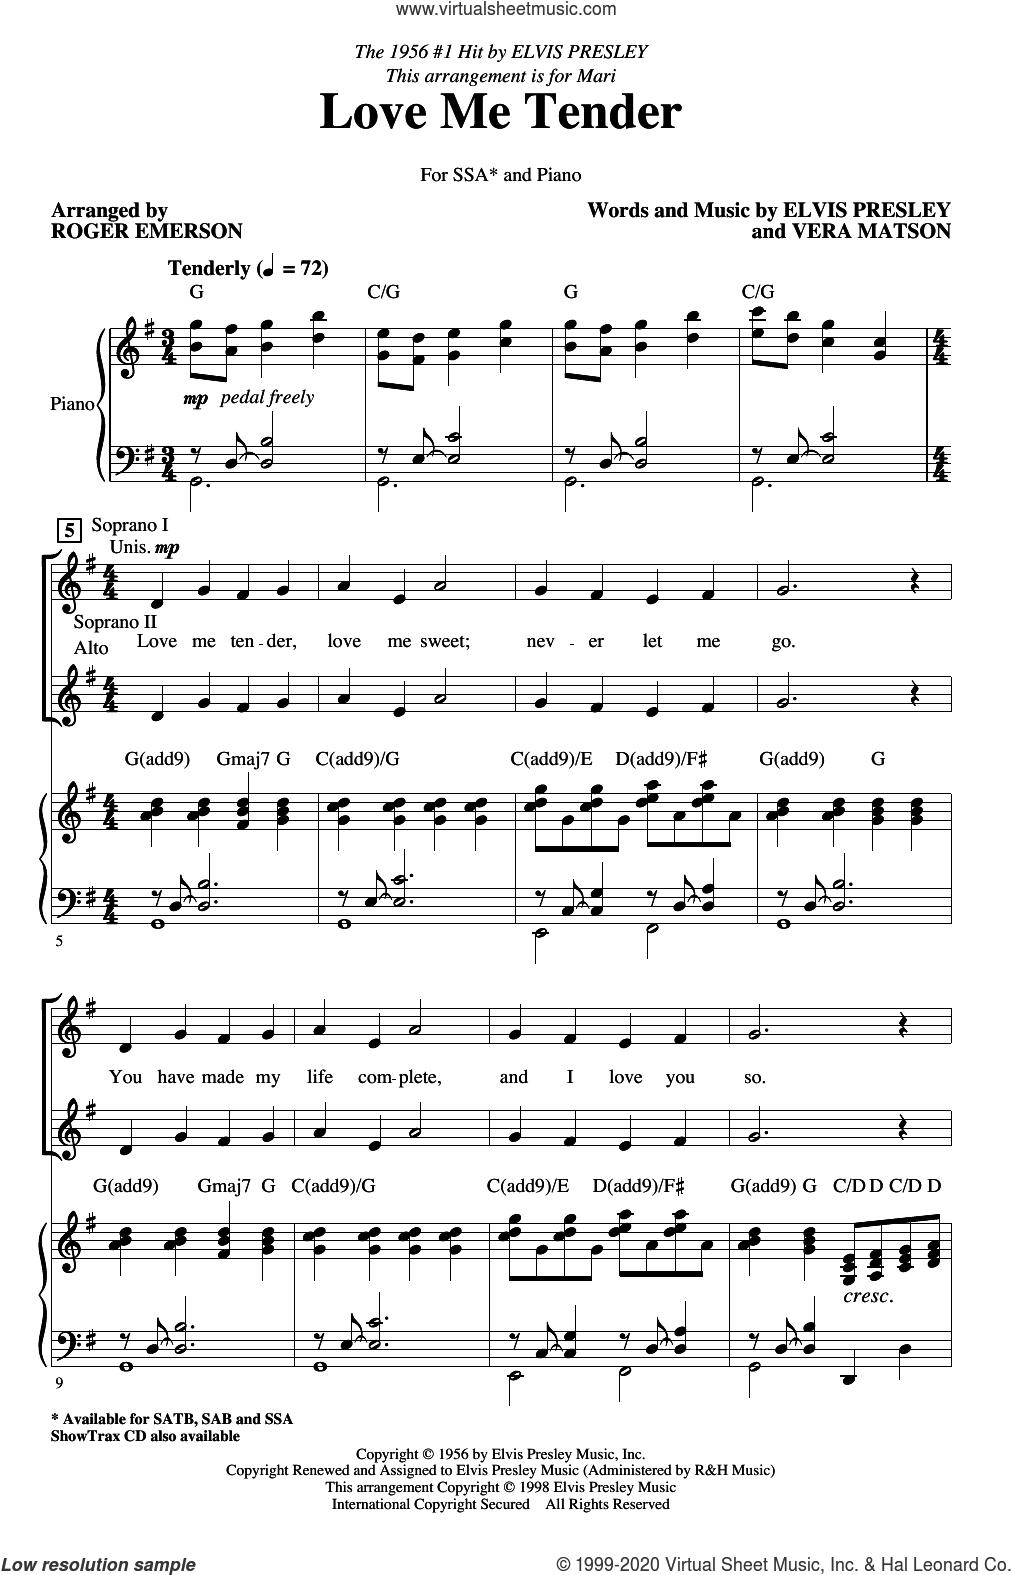 Love Me Tender (arr. Roger Emerson) sheet music for choir (SSA: soprano, alto) by Elvis Presley, Roger Emerson and Vera Matson, intermediate skill level